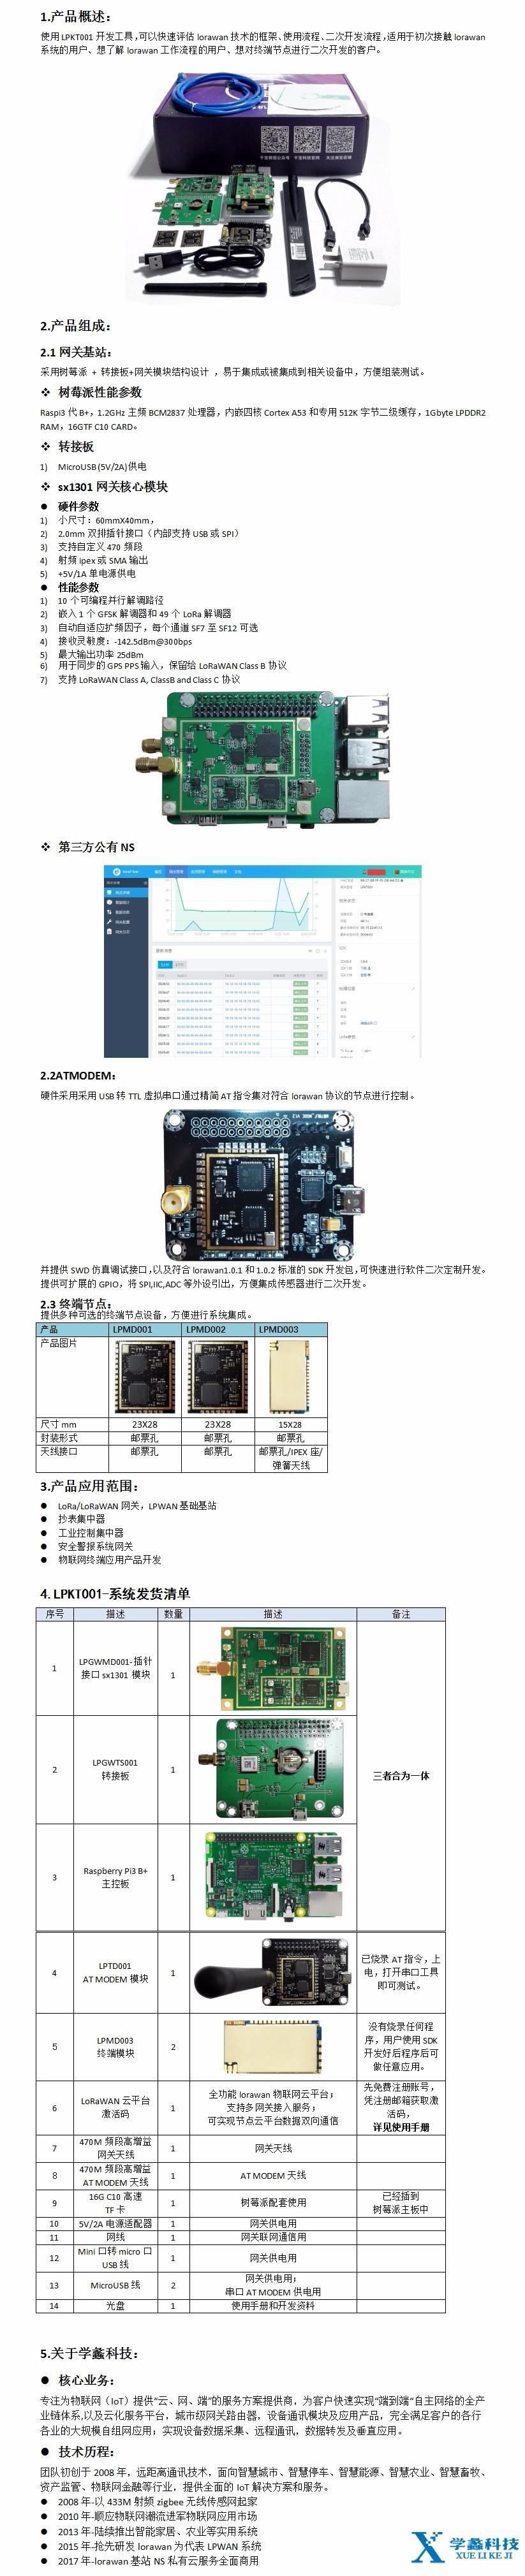 LPKT001-初级lorawan开发套件-产品简介-V1.00.jpg